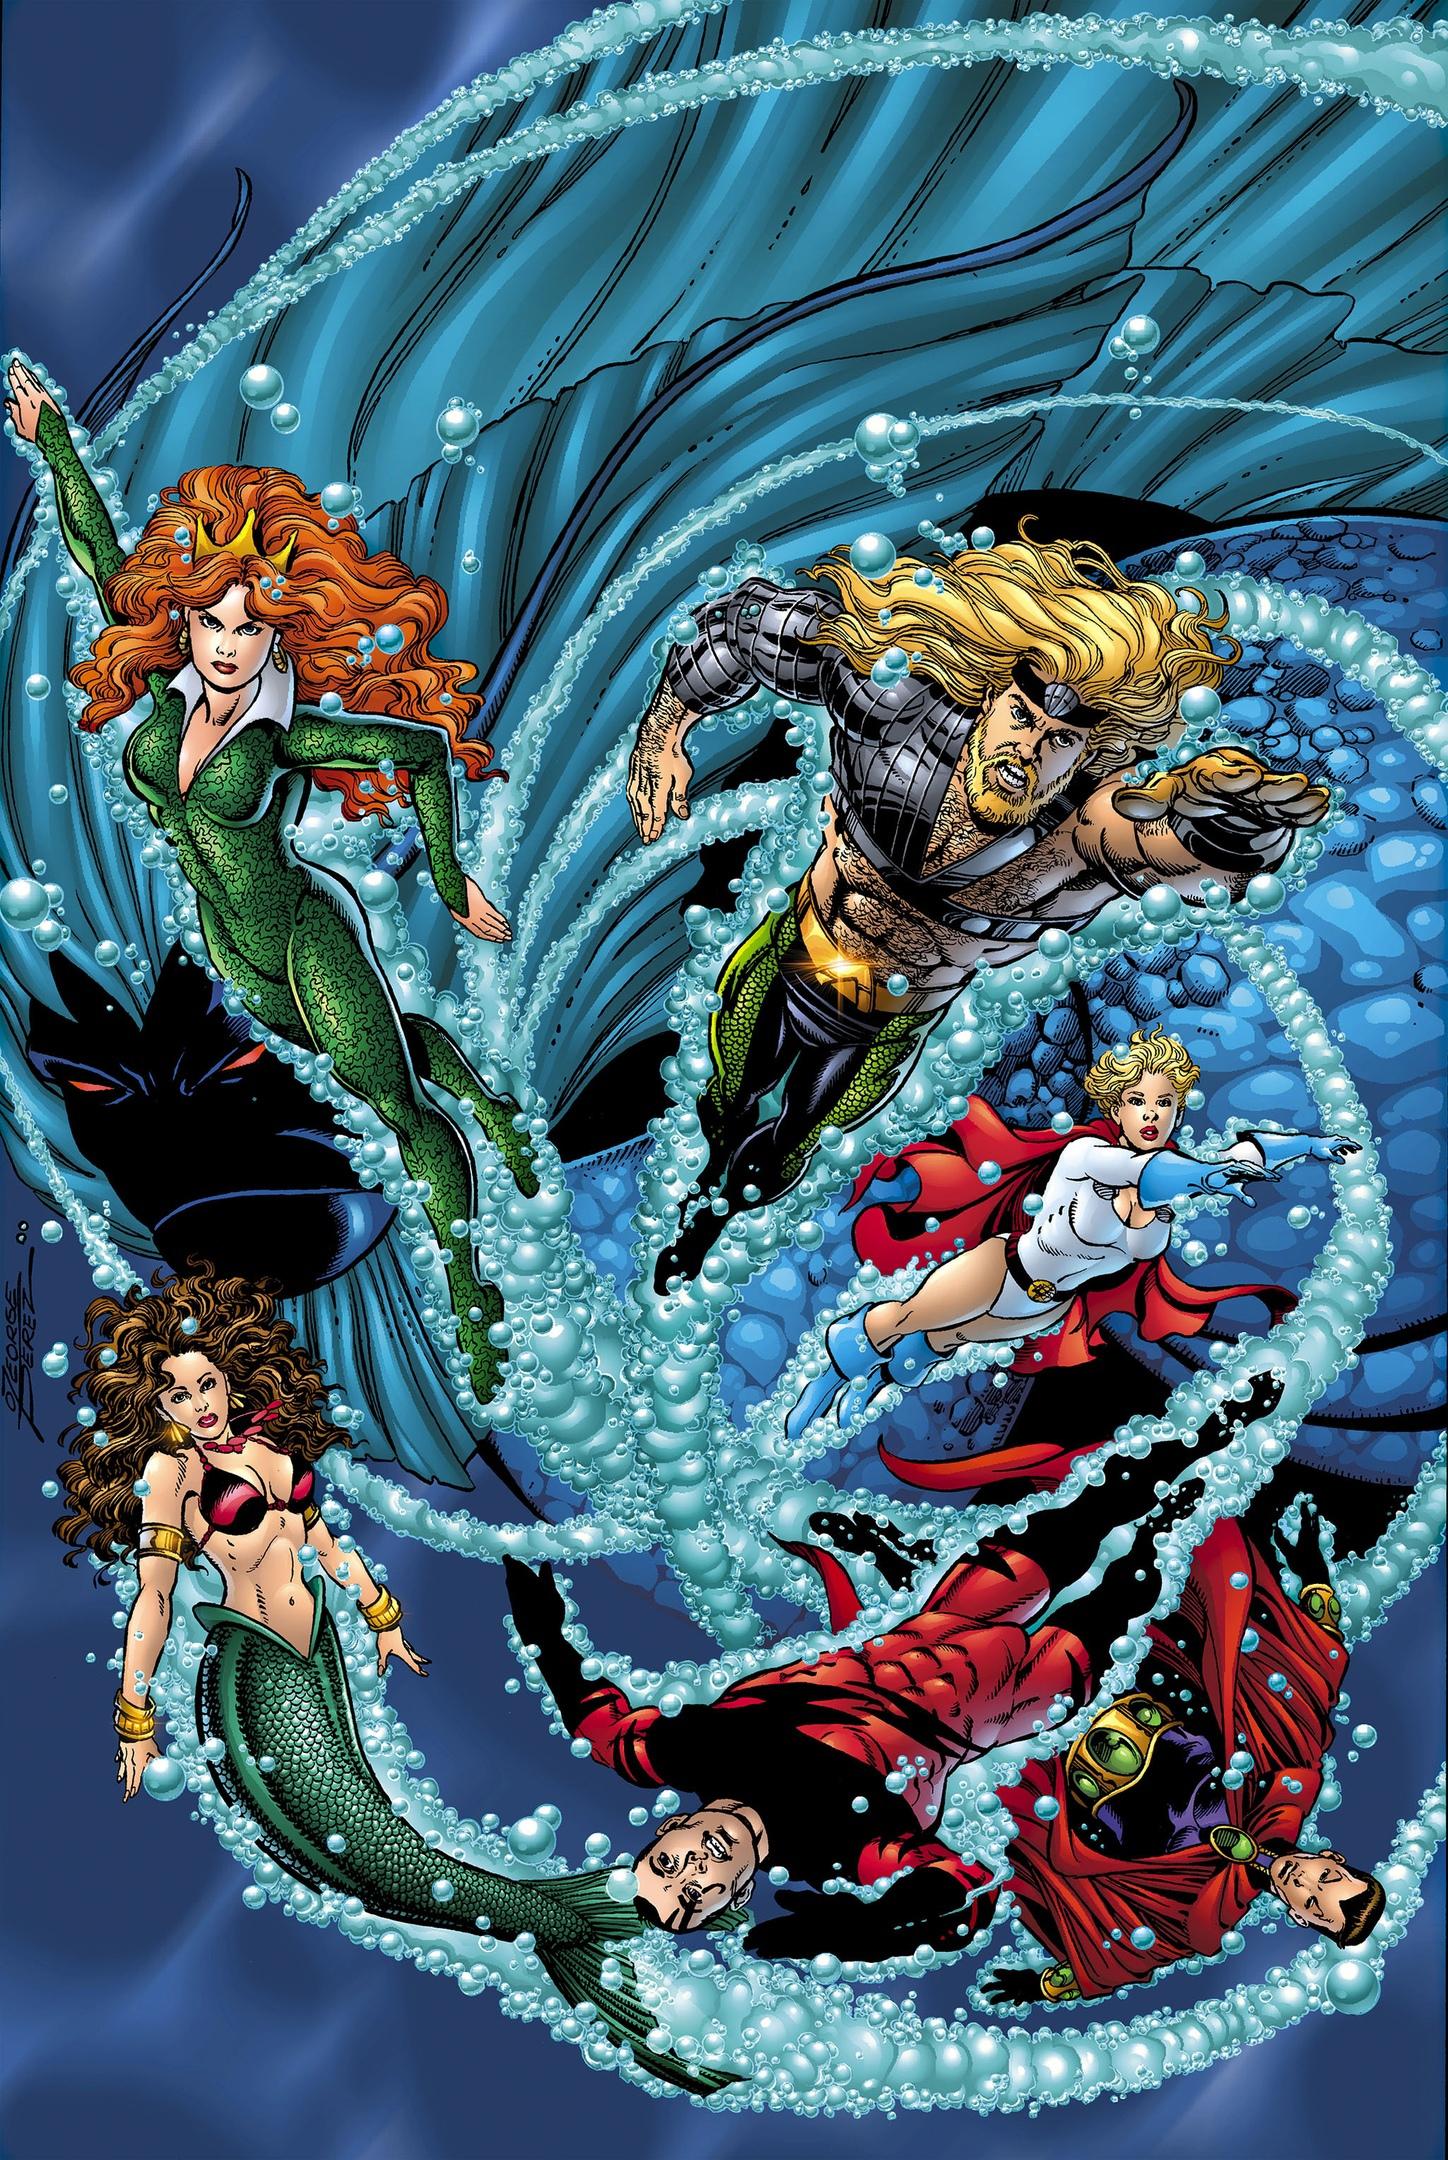 Justice Leagues Justice League of Atlantis Vol 1 1 Textless.jpg